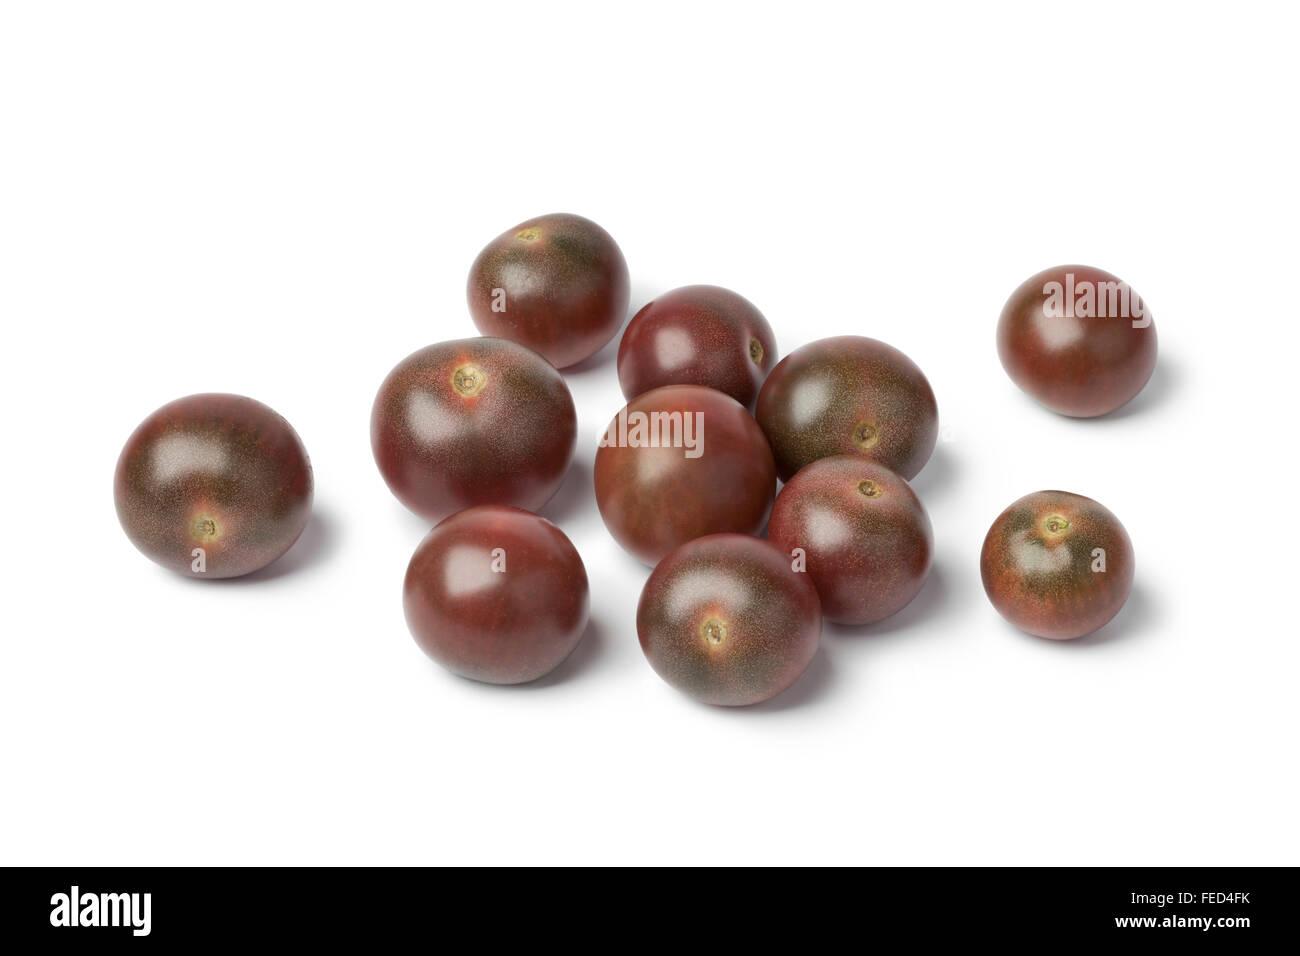 Tomates frescos bebé marrón sobre fondo blanco. Imagen De Stock